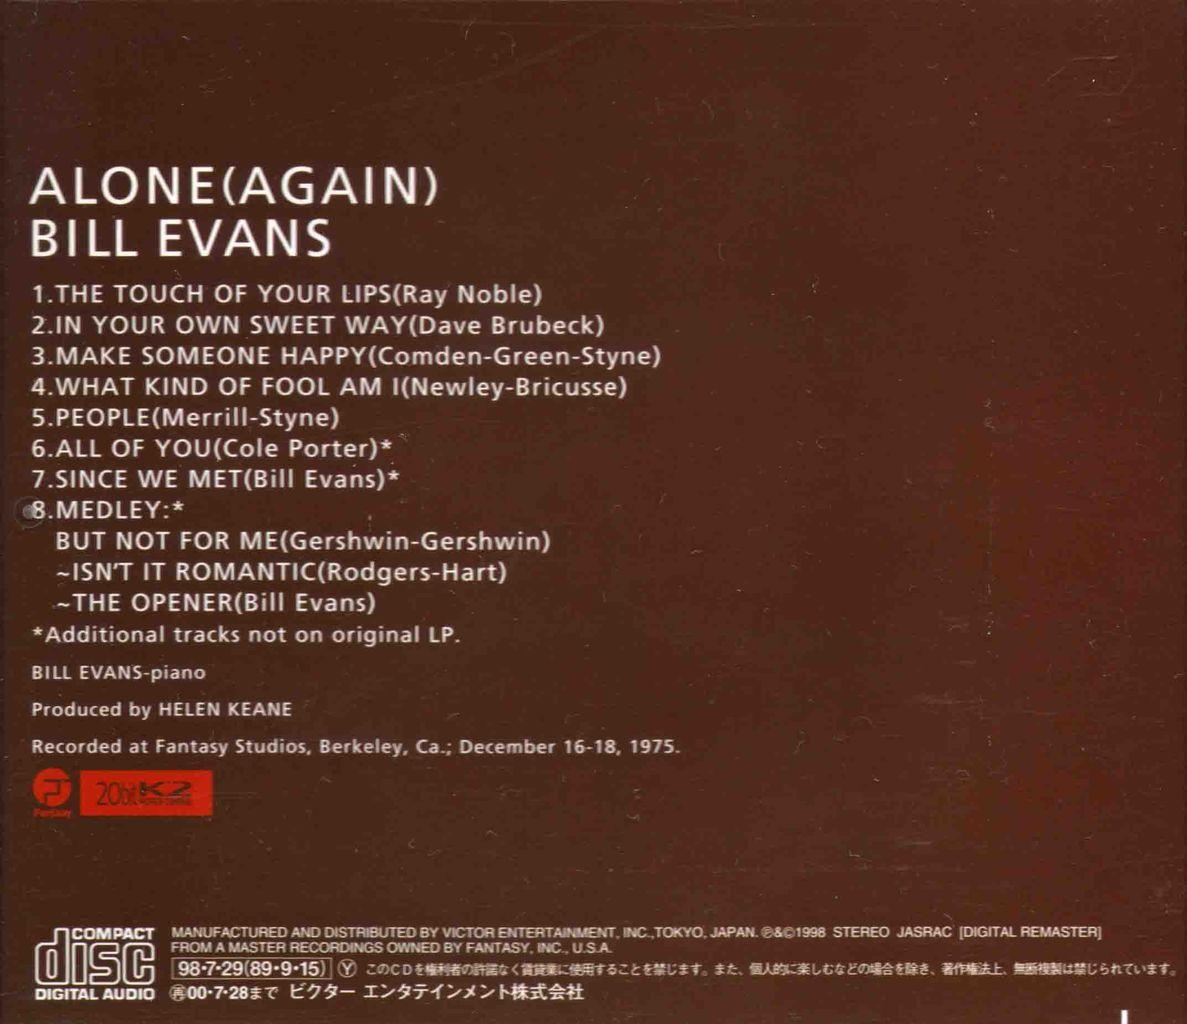 ALONE(AGAIN)-2